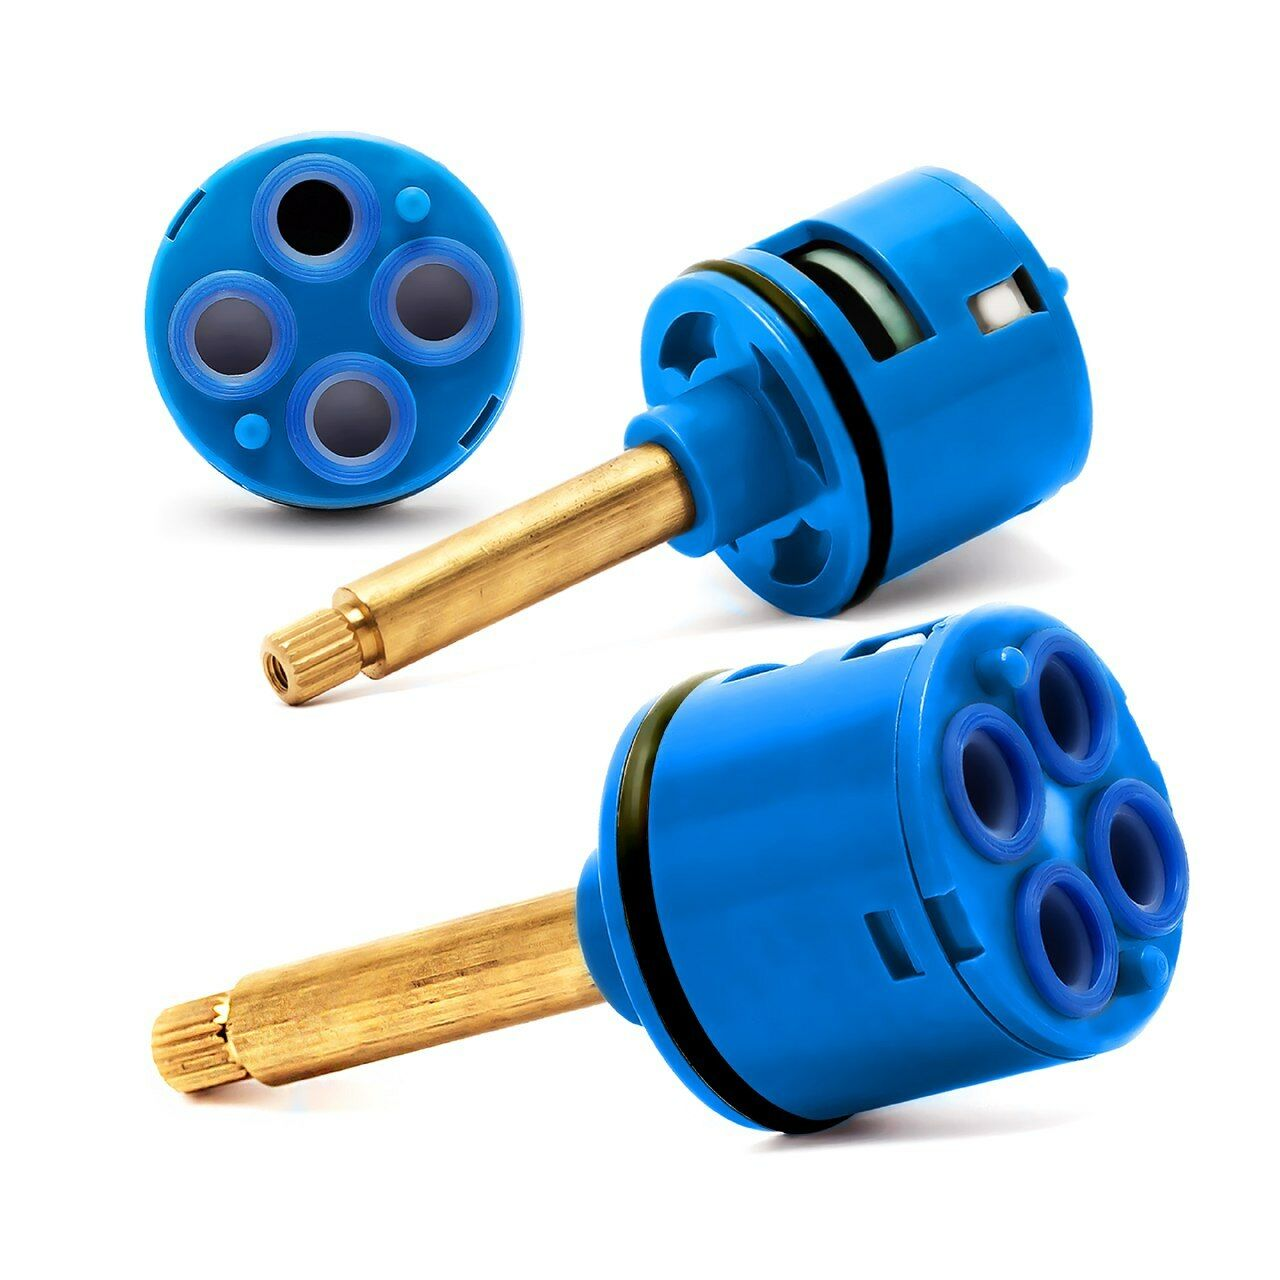 Shower Valve Cartridge 4 Way Panel Faucet Cartridge Brass Handle D 37 L 40mm